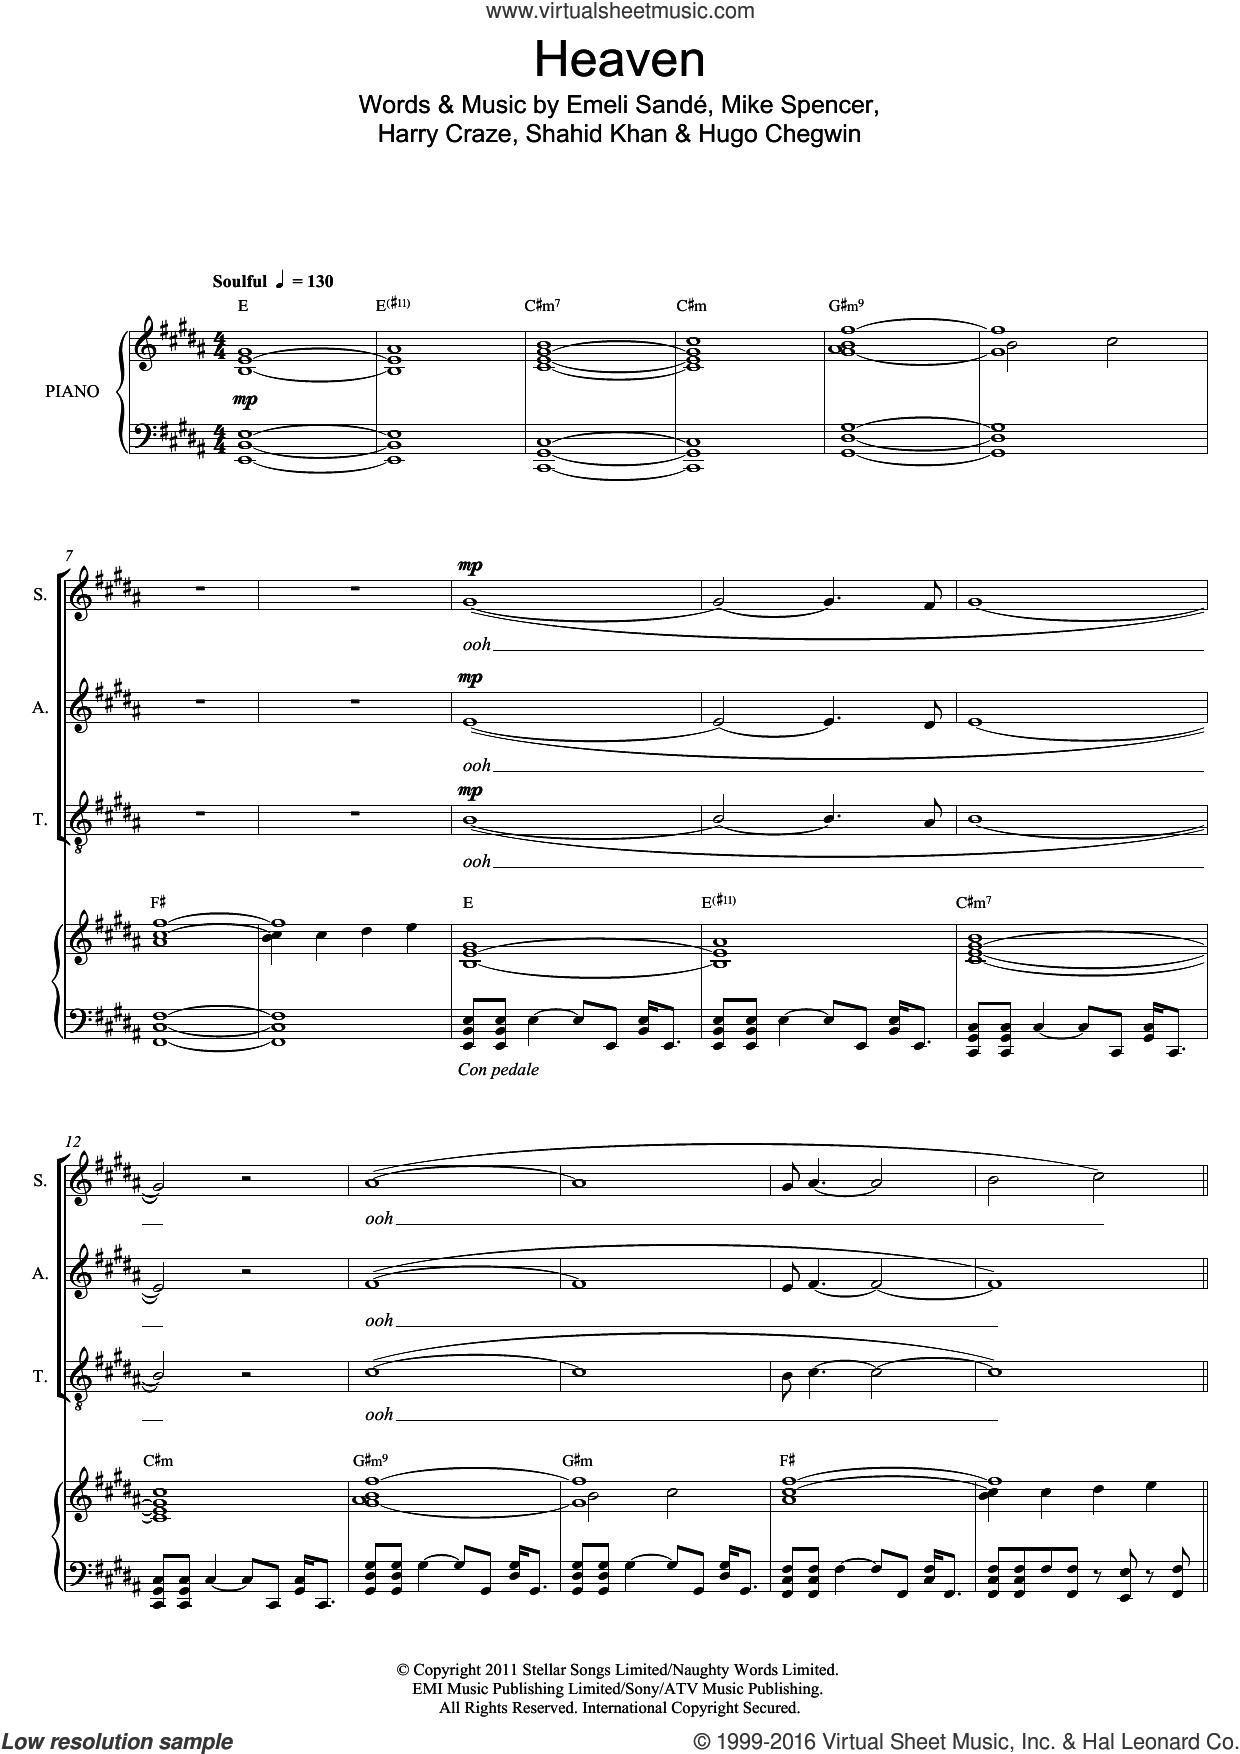 Heaven sheet music for voice, piano or guitar by Emeli Sande, Mark De-Lisser, Harry Craze, Hugo Chegwin, Mike Spencer and Shahid Khan, intermediate skill level